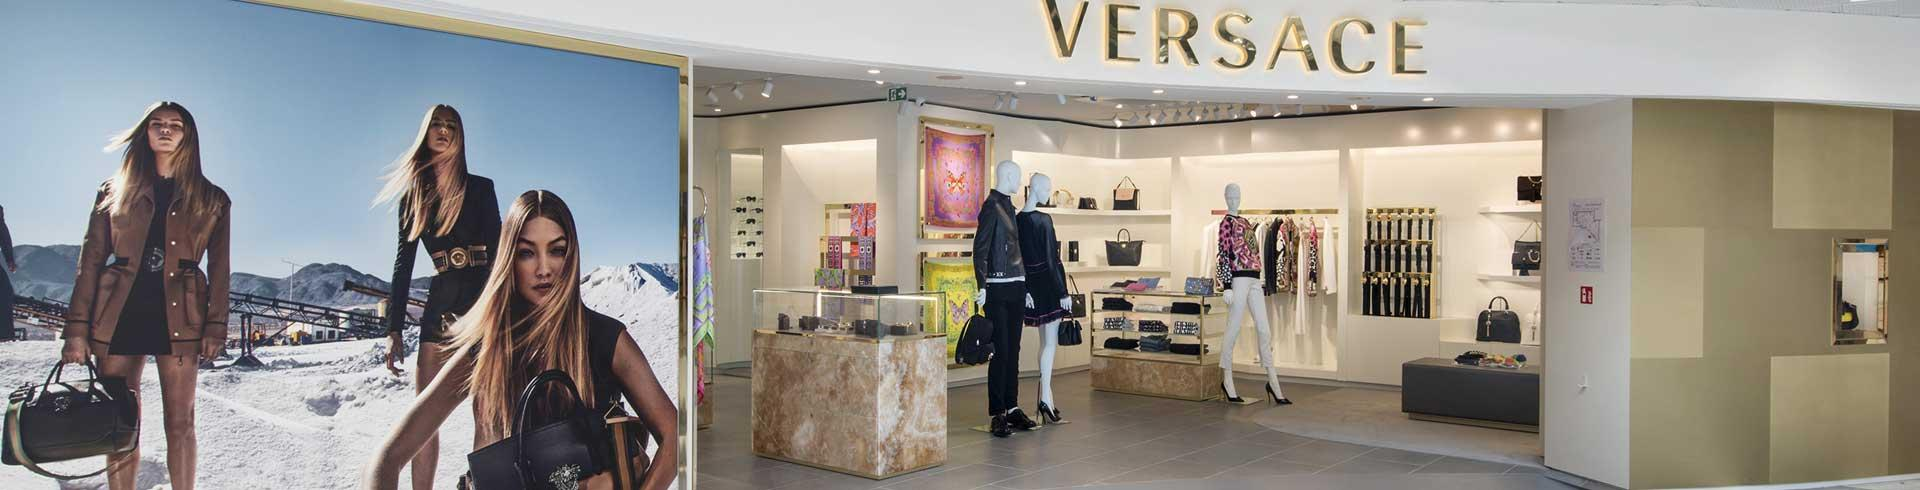 versace fashion accessories terminal 1 shops services la promenade nice airport. Black Bedroom Furniture Sets. Home Design Ideas